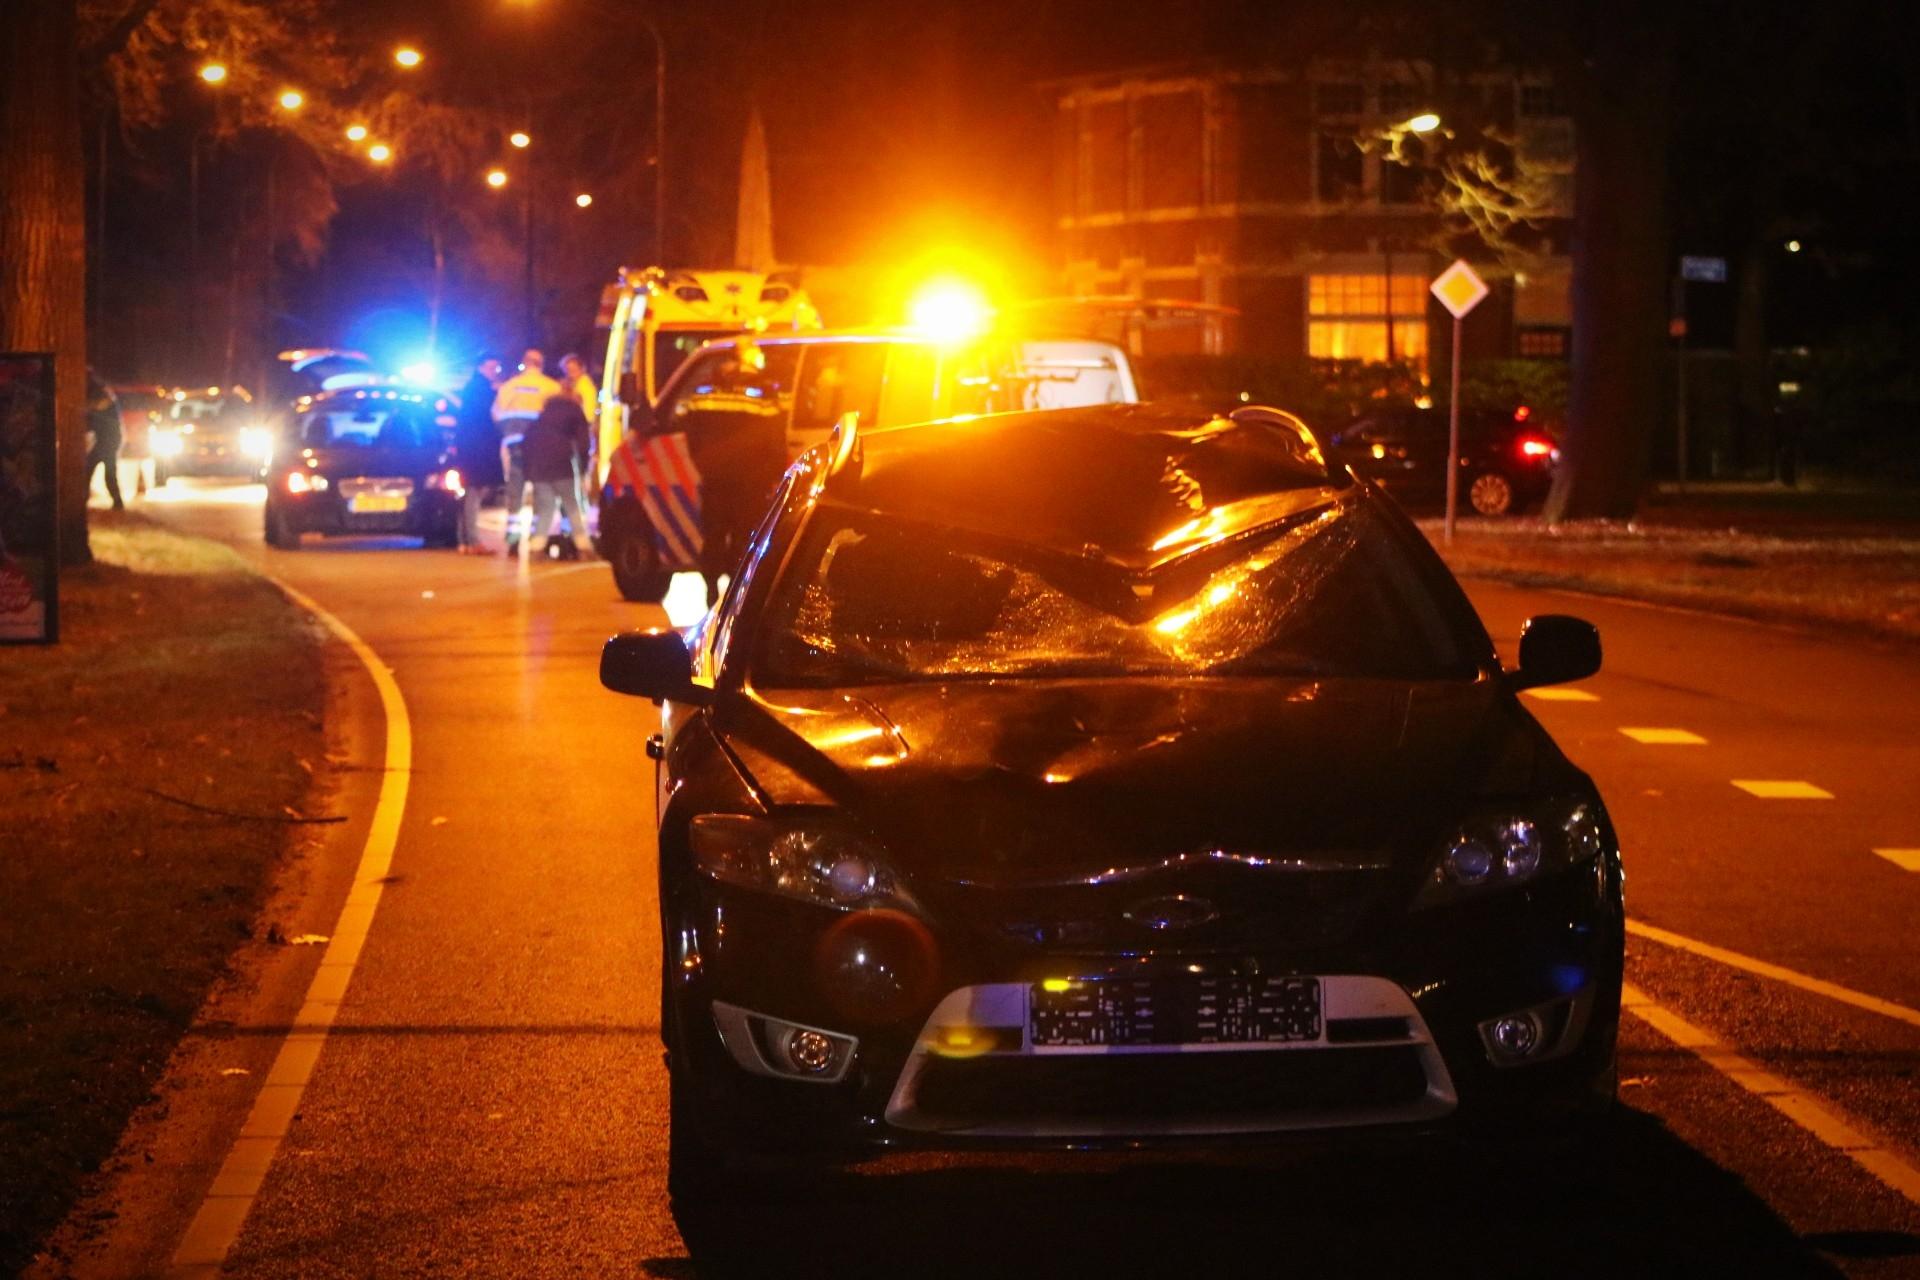 Fietser overleden na ernstig ongeval